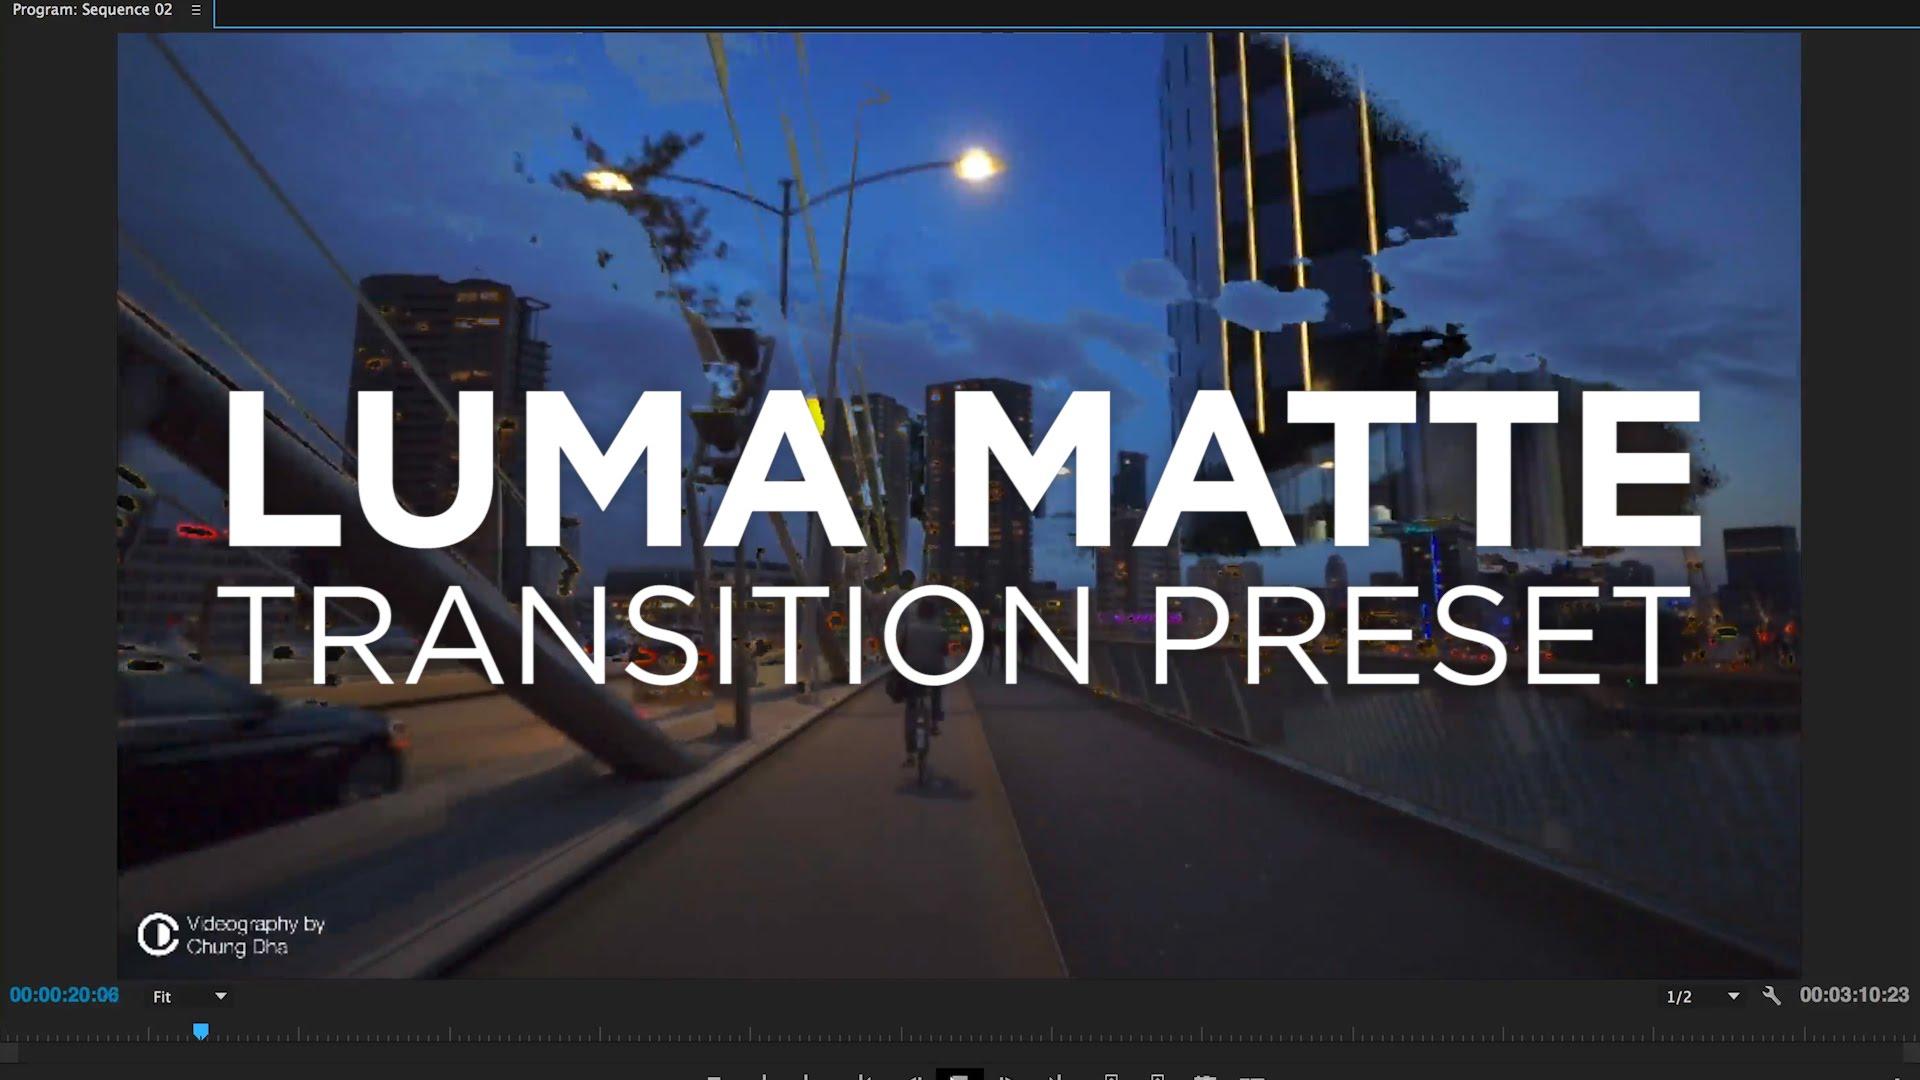 Luma Matte Transition Preset #adobe #premierepro #videoediting